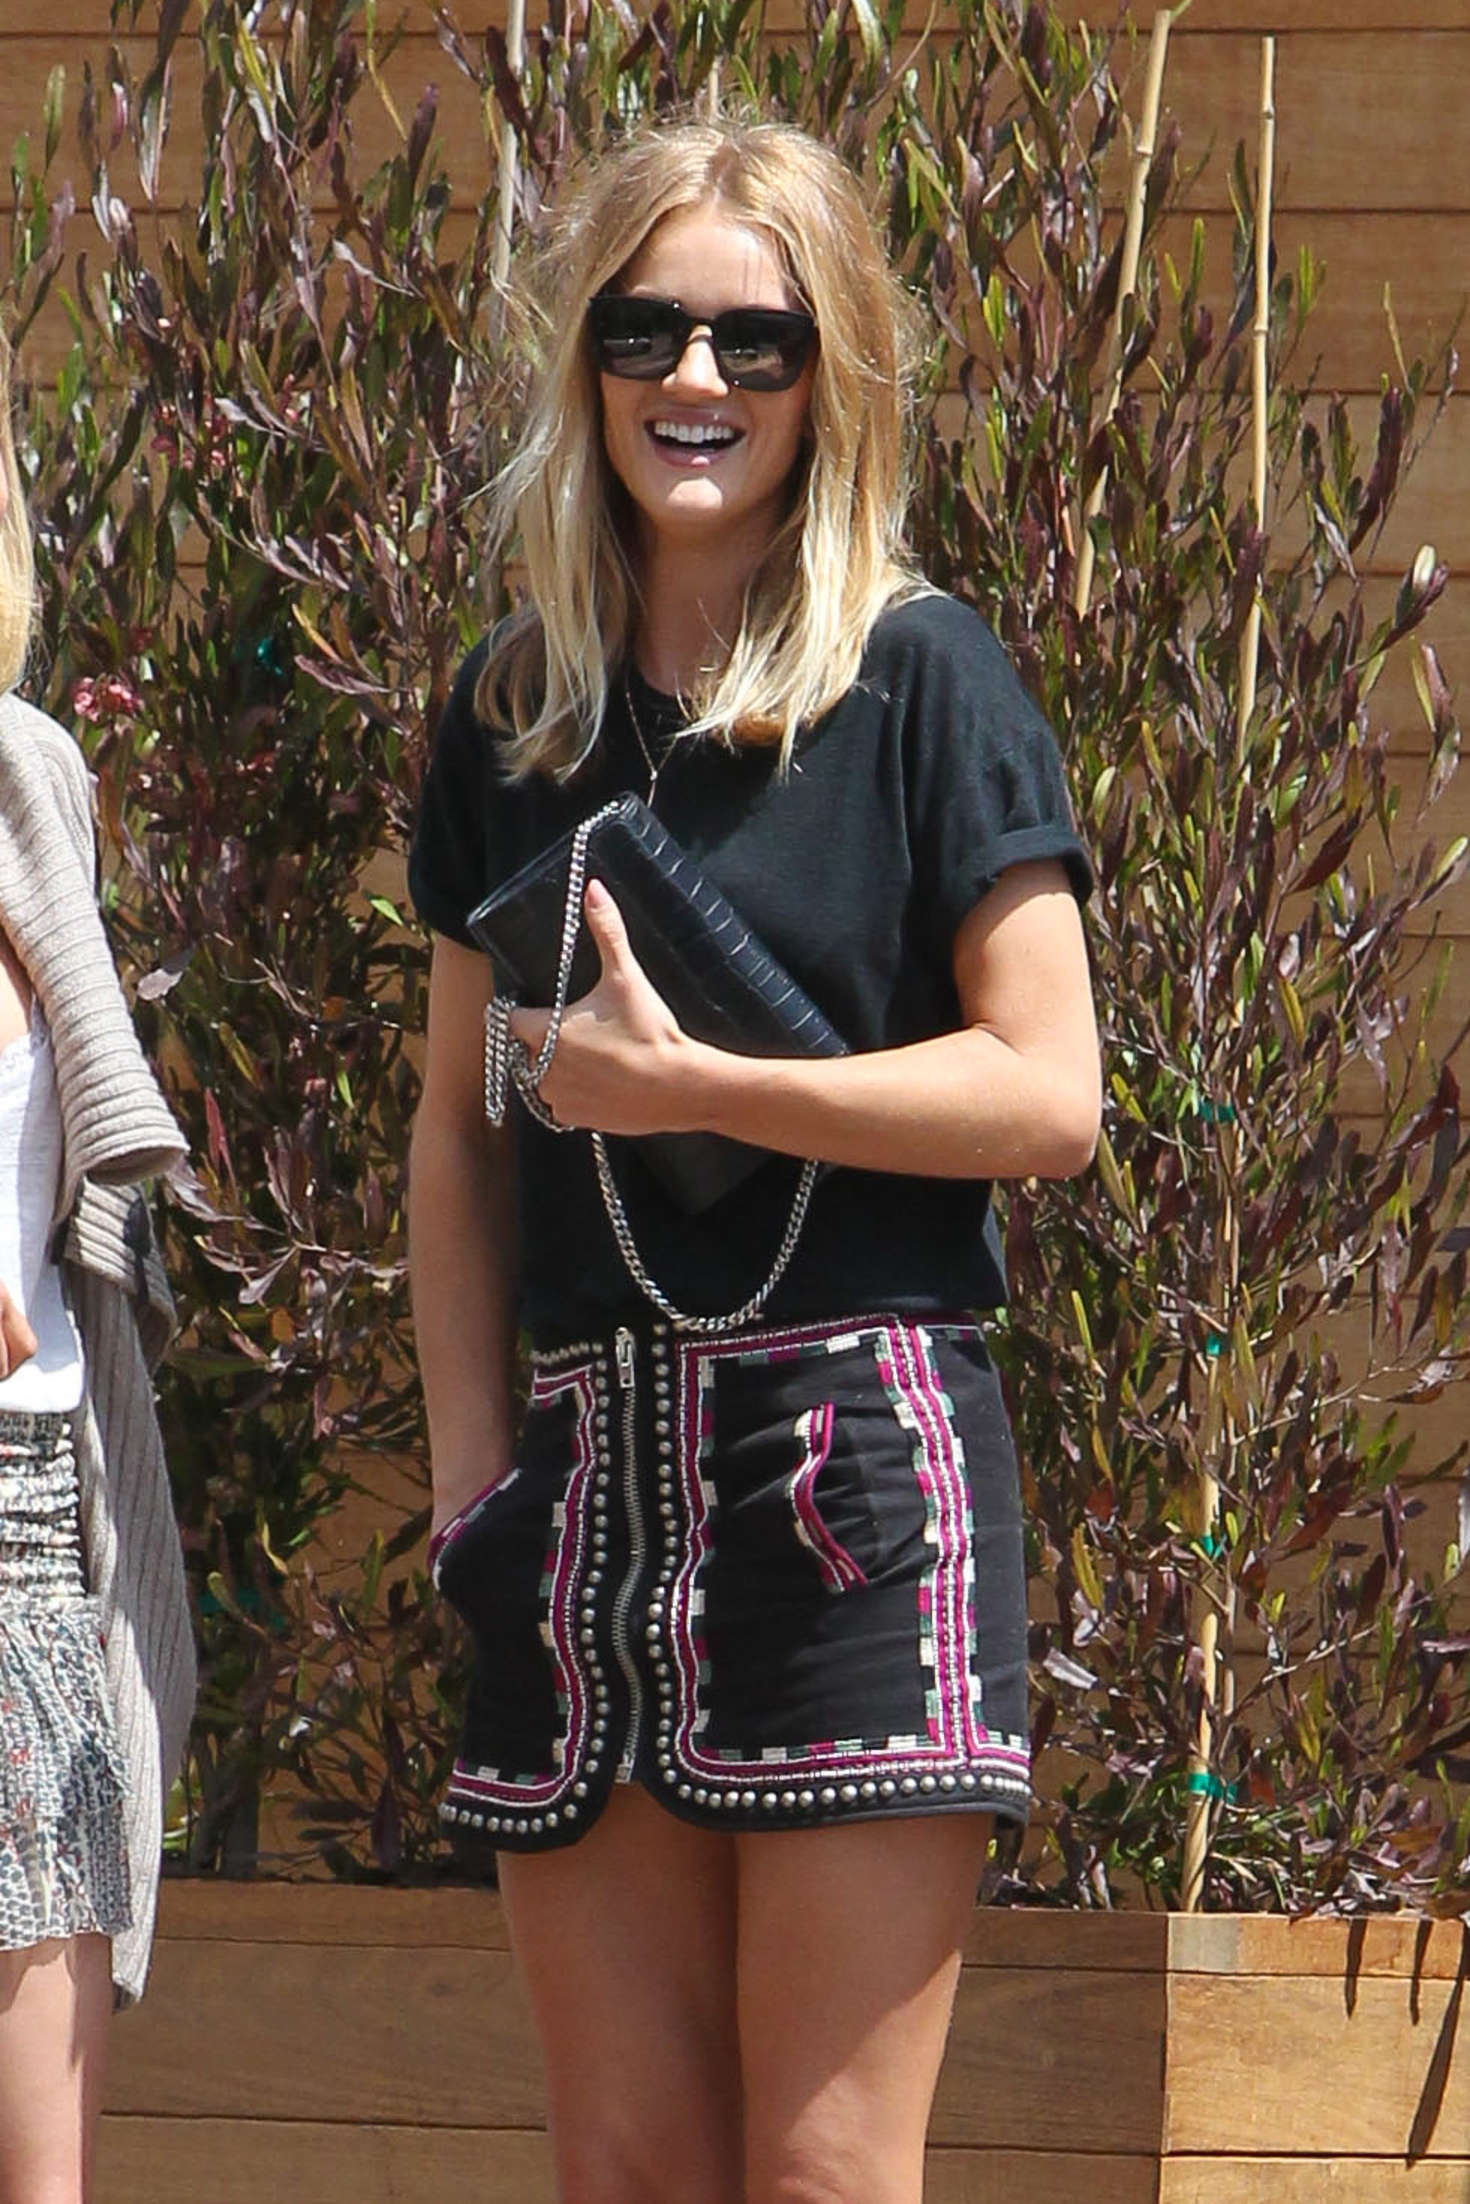 Rosie Huntington Whiteley In Mini Skirt At Soho House In